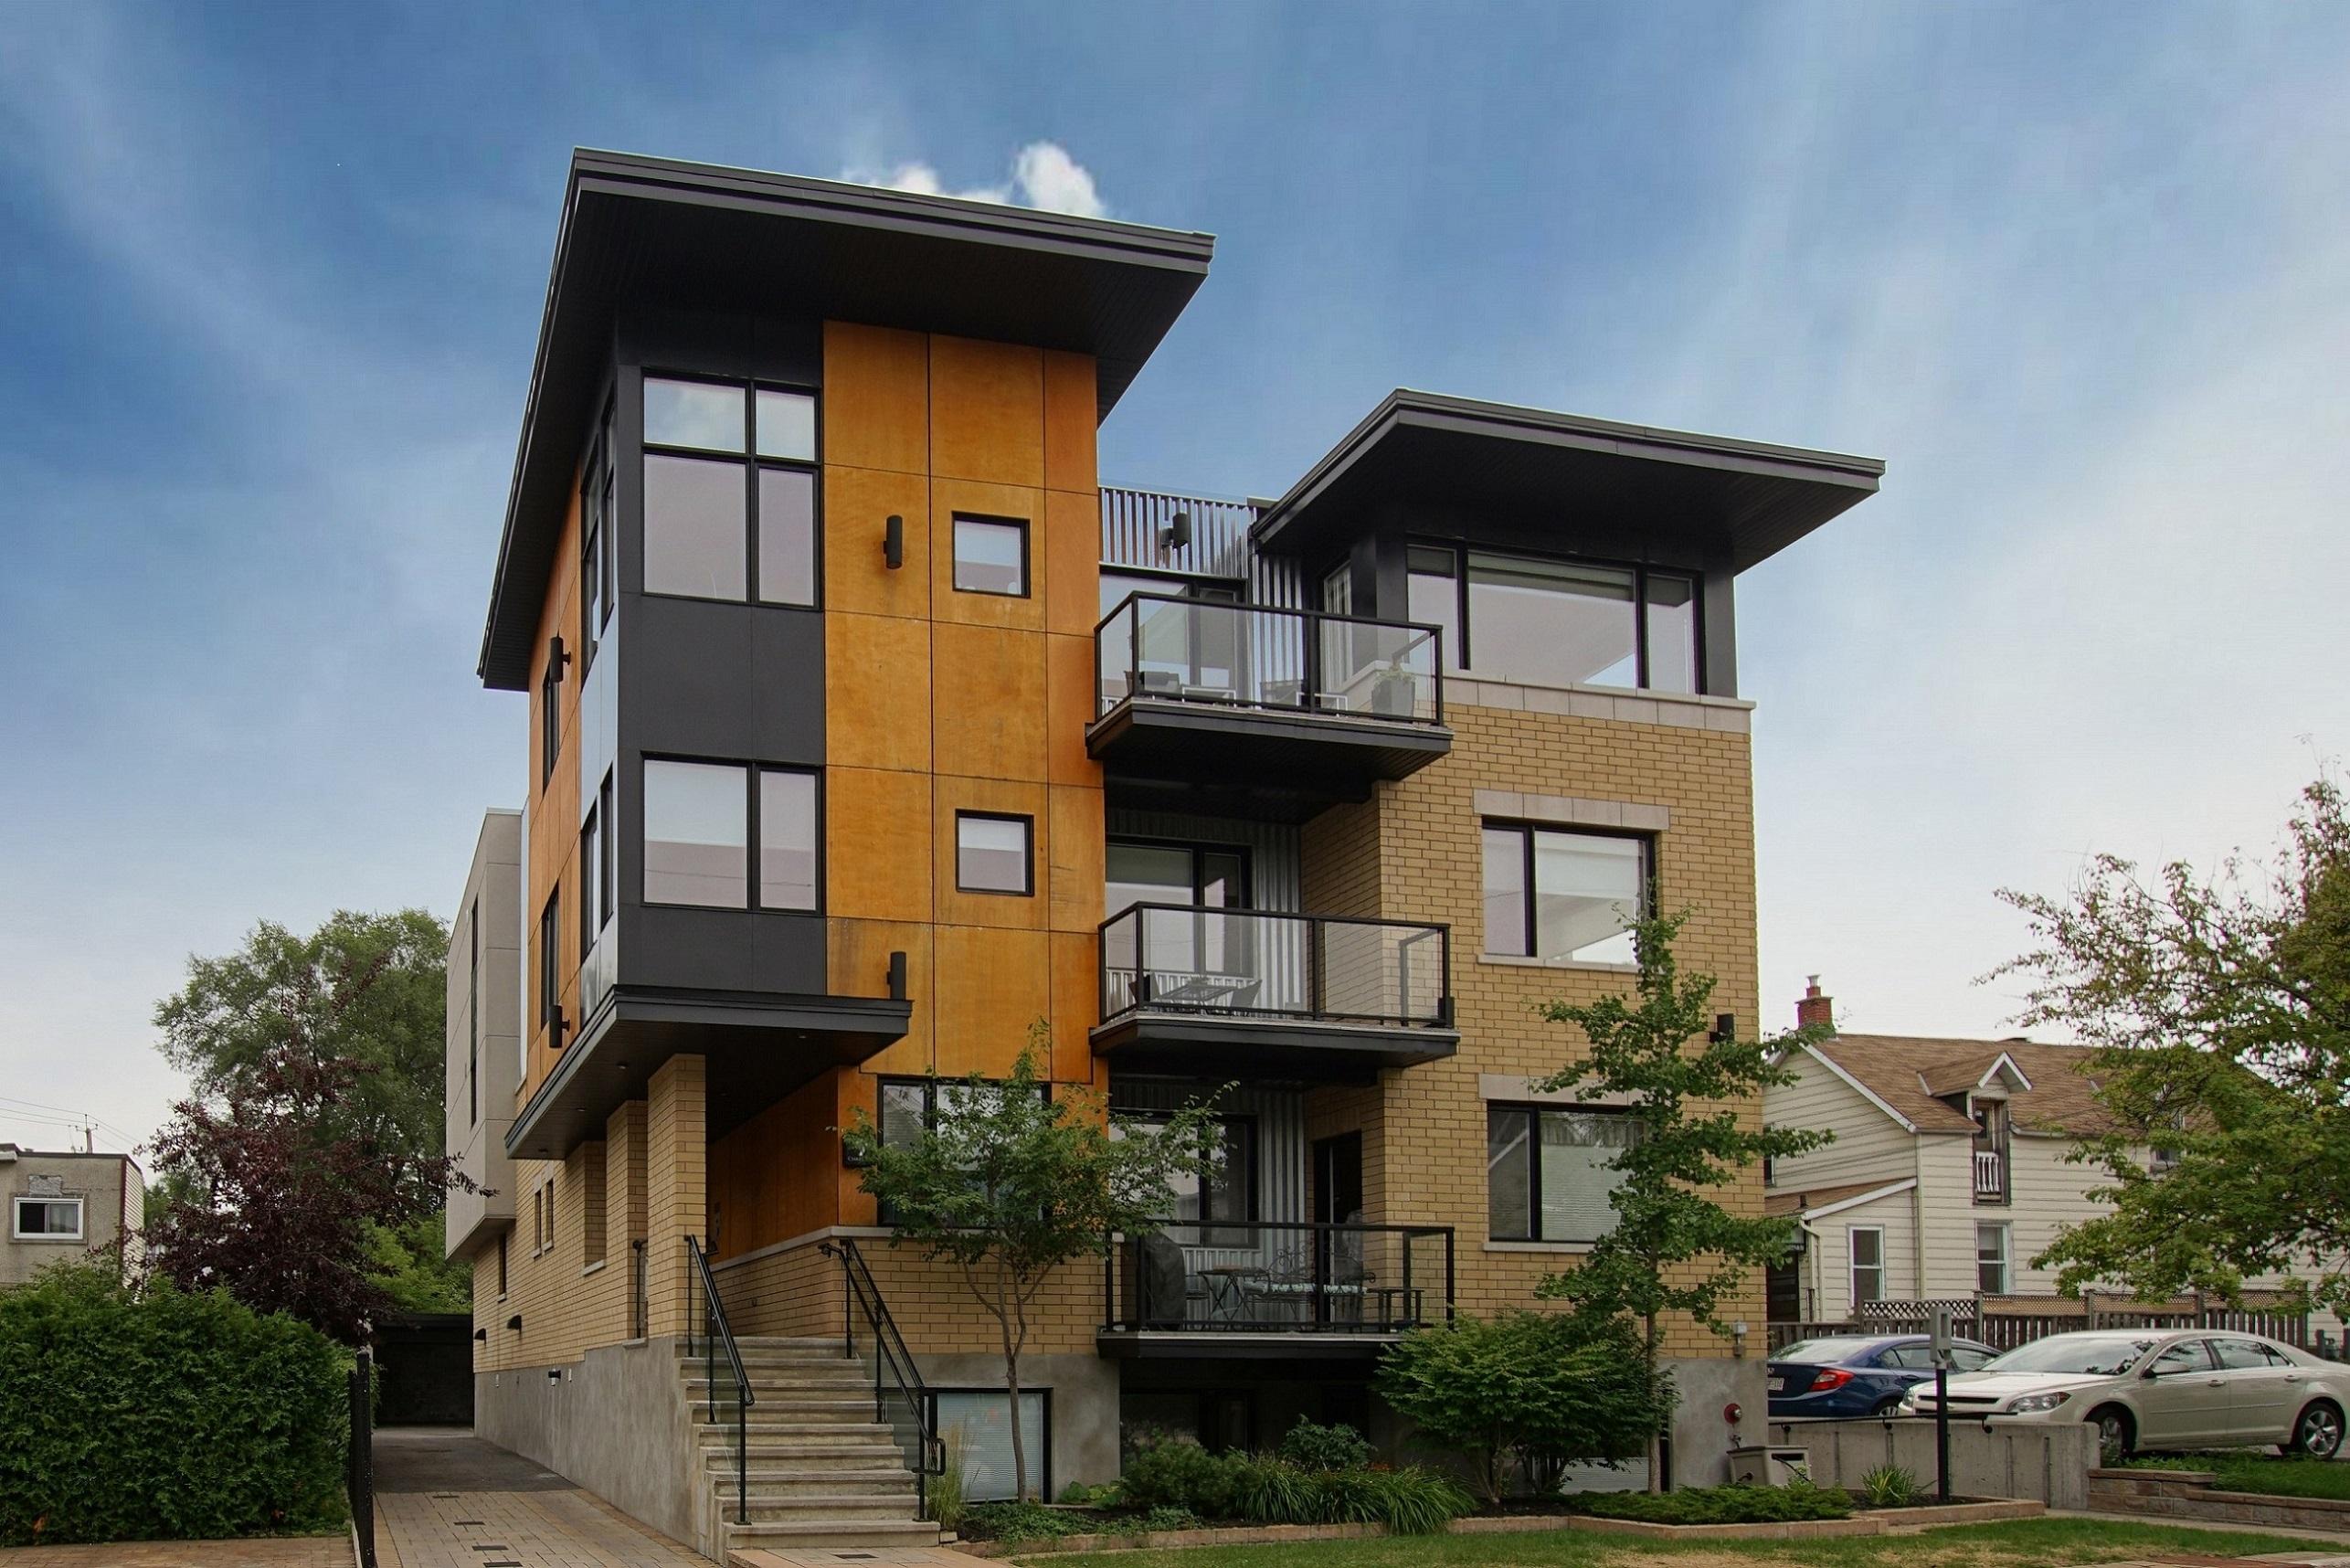 9 Chapleau Avenue Unit 301 | Modern and Chic Condo in Beachwood Village